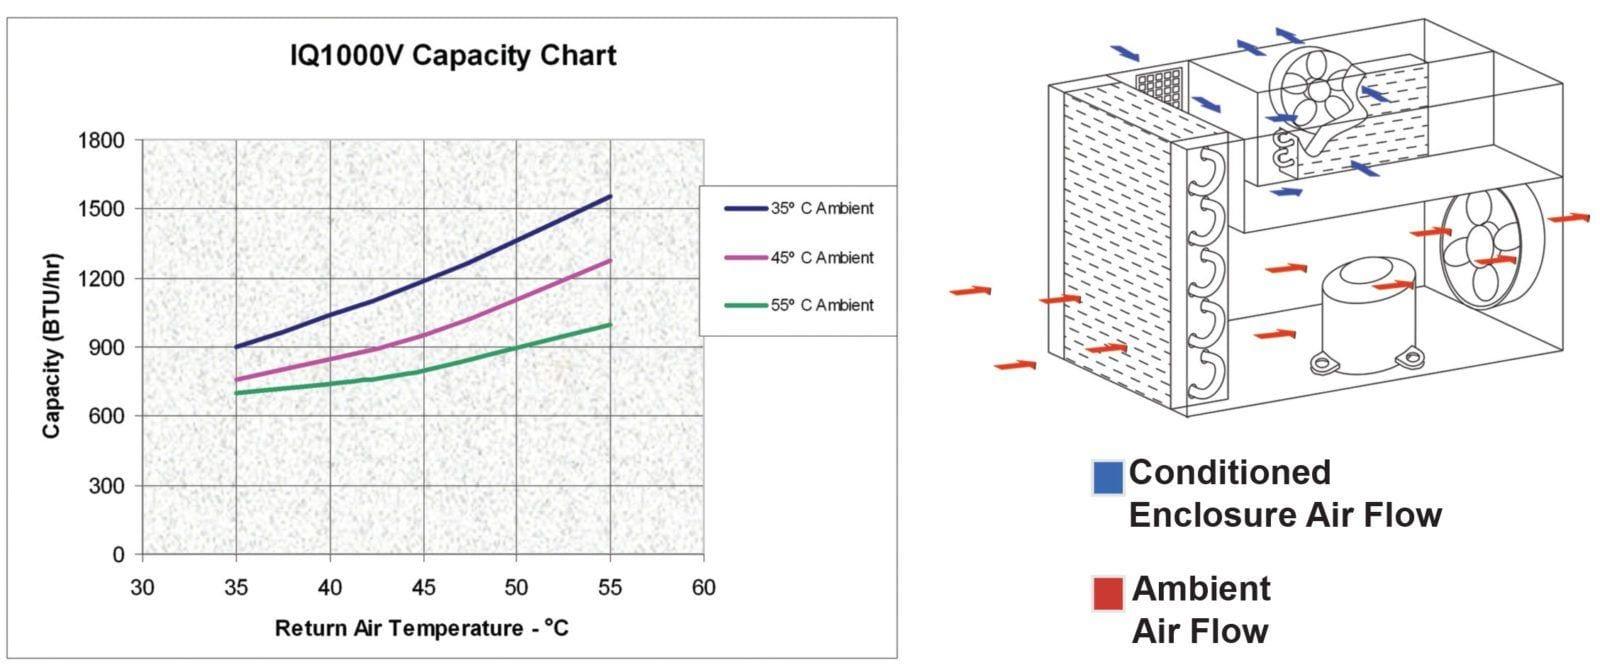 IQ1000V-120-Airflow-Capacity